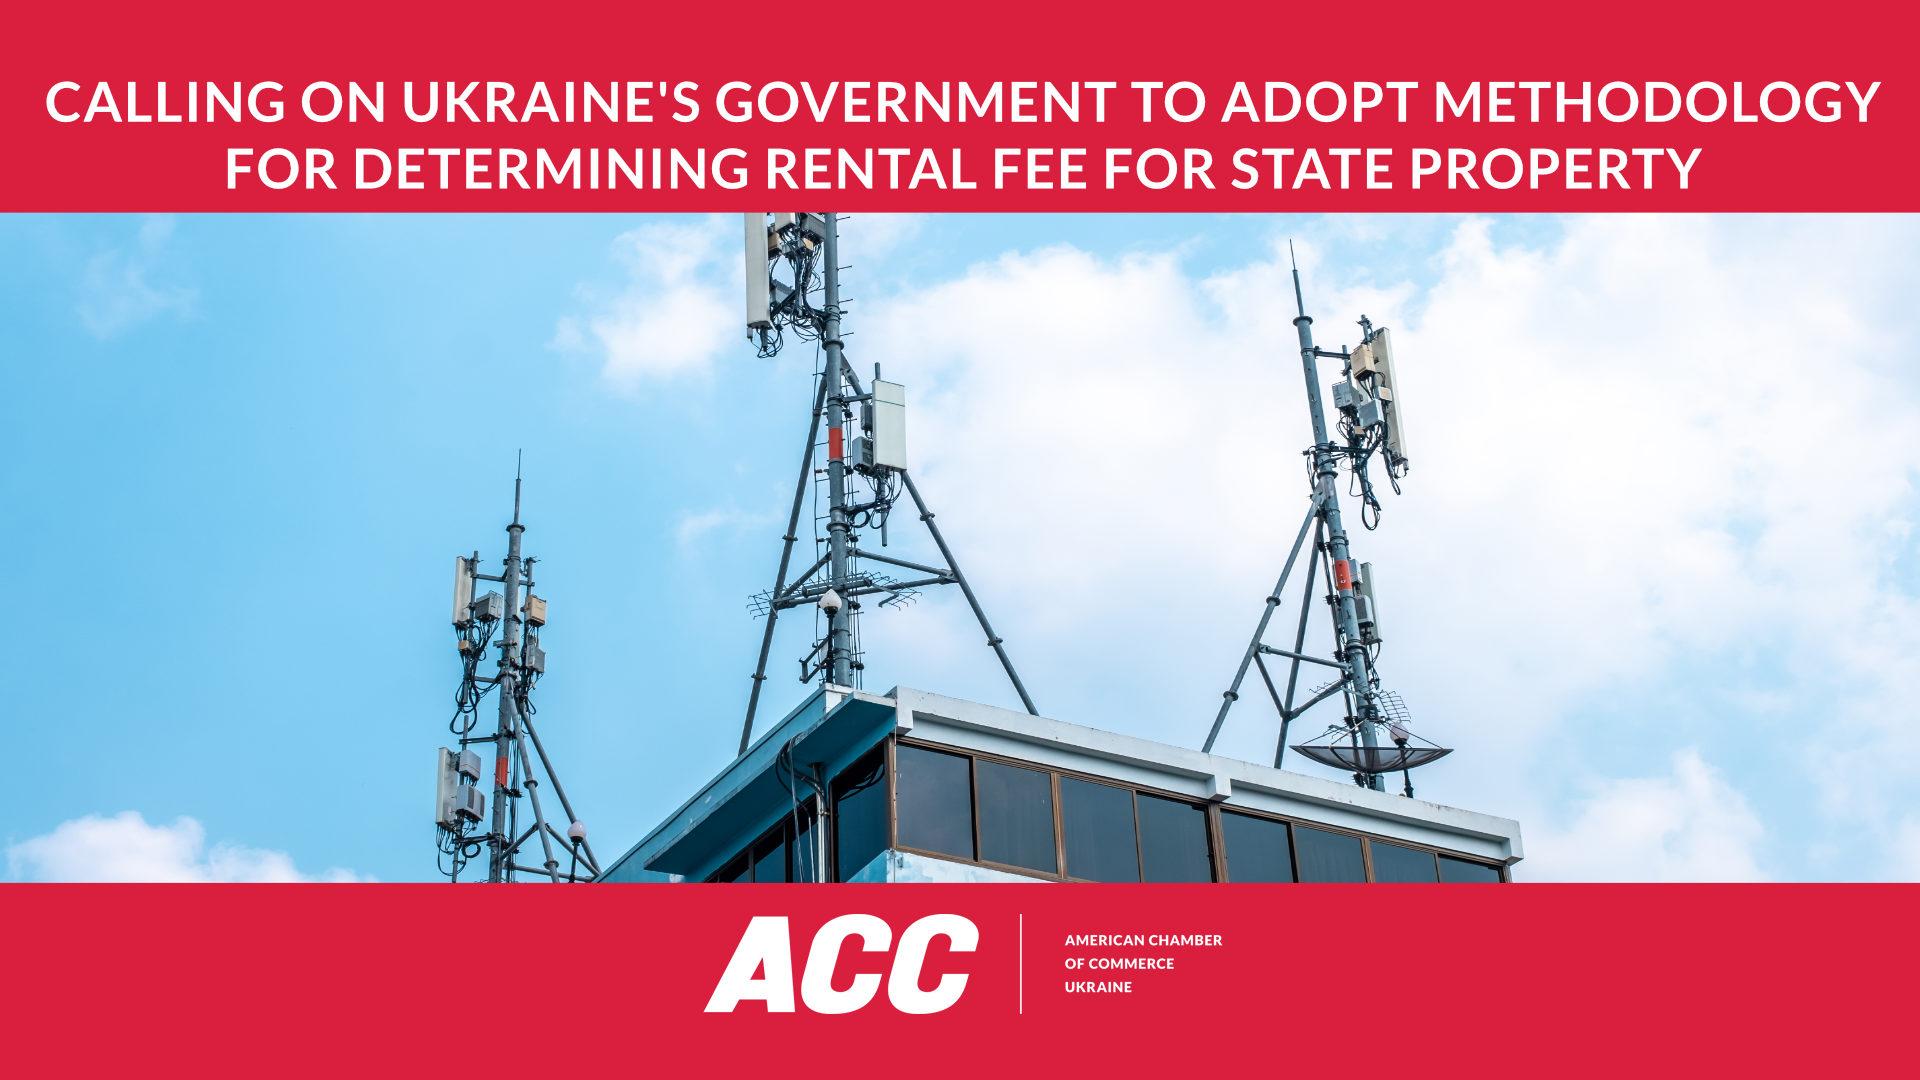 AmCham Ukraine Calls on Ukraine's Government to Adopt Methodology for Determining Rental Fee for State Property